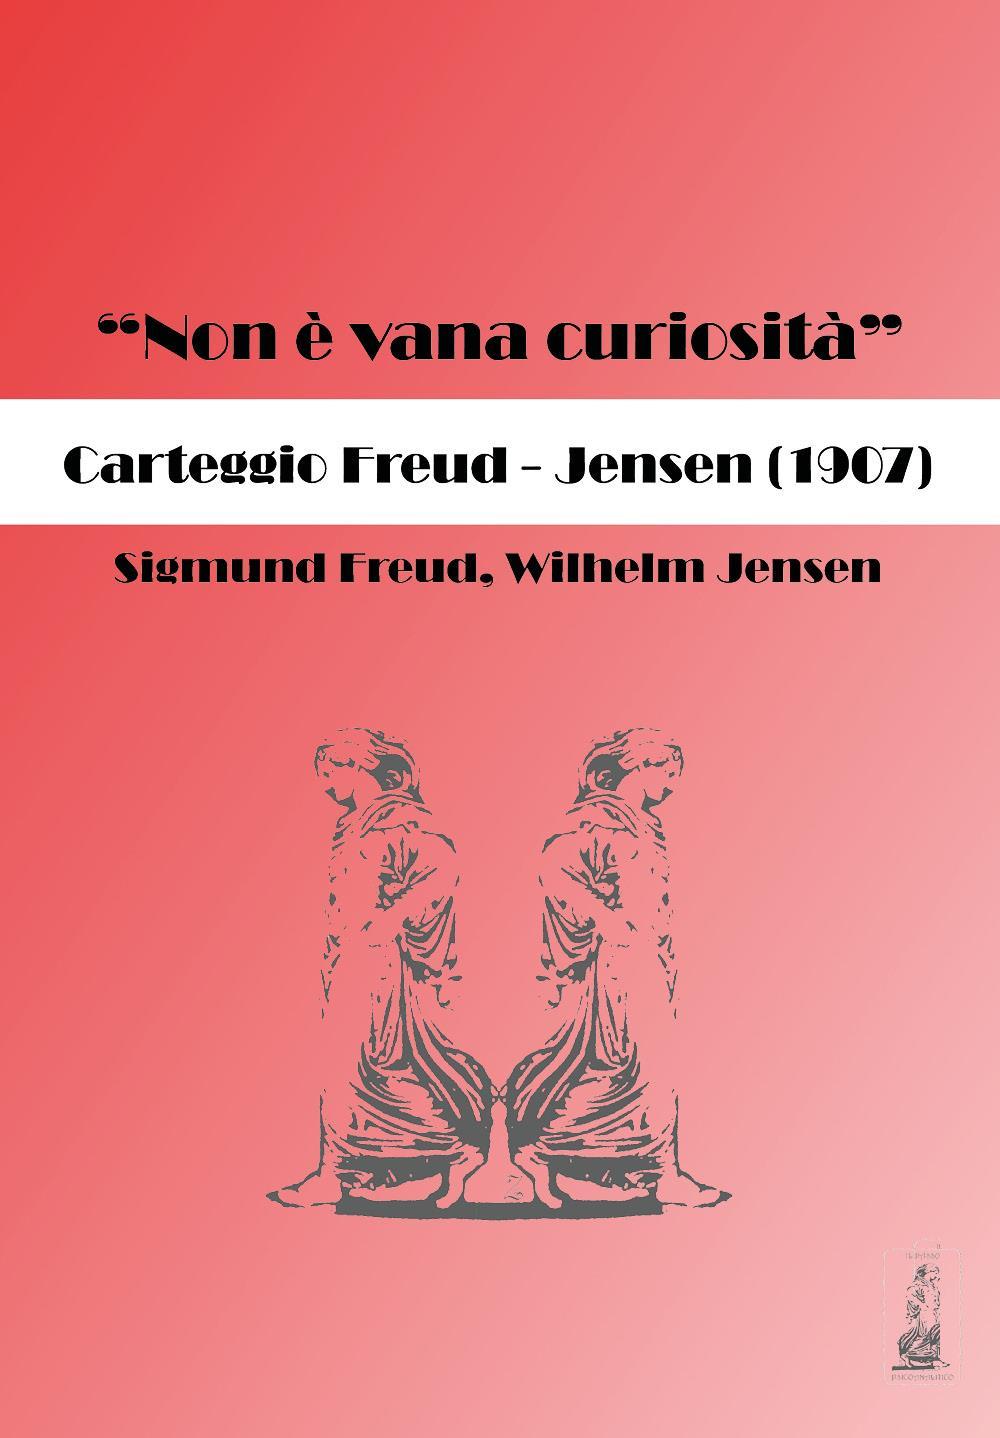 """Non è vana curiosità"". Carteggio Freud-Jensen (1907)"